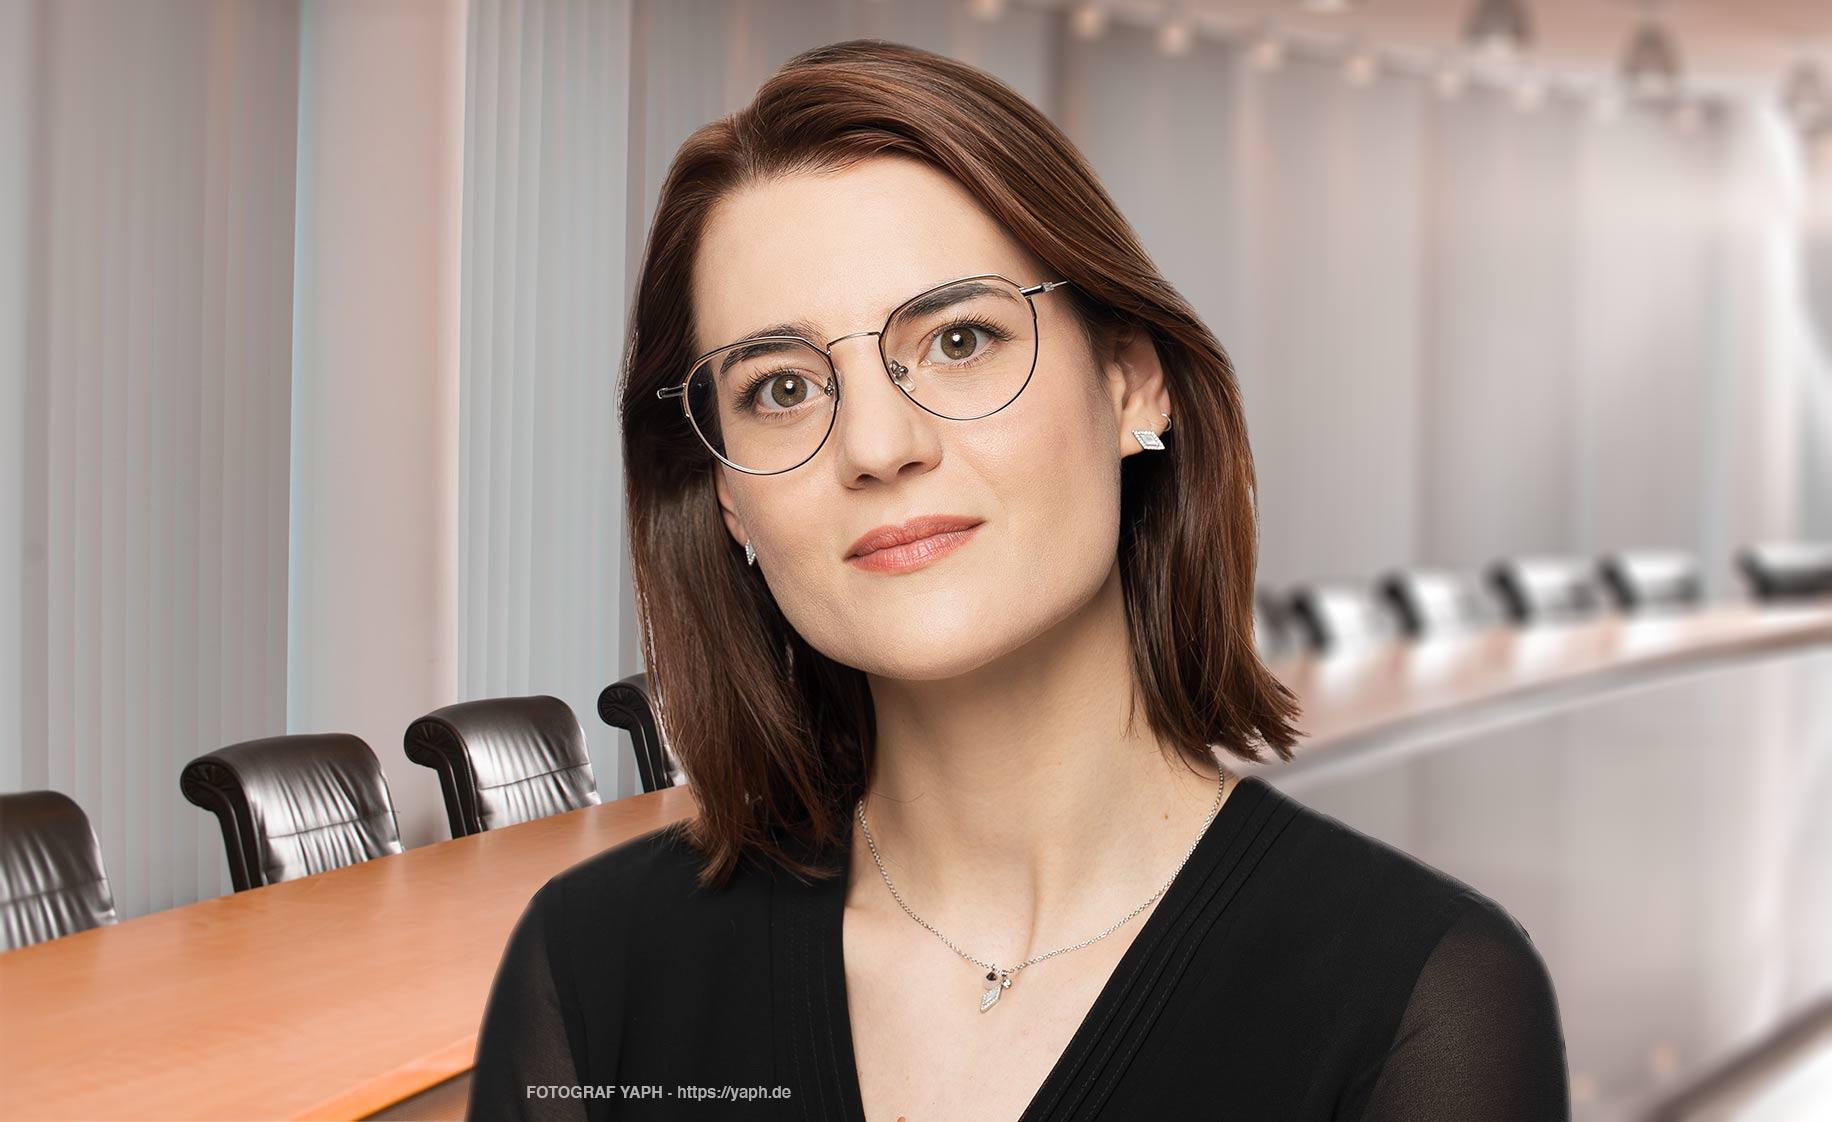 Yaph - Fotograf Bewerbungsfoto Trier und Business Portraits- Hannah